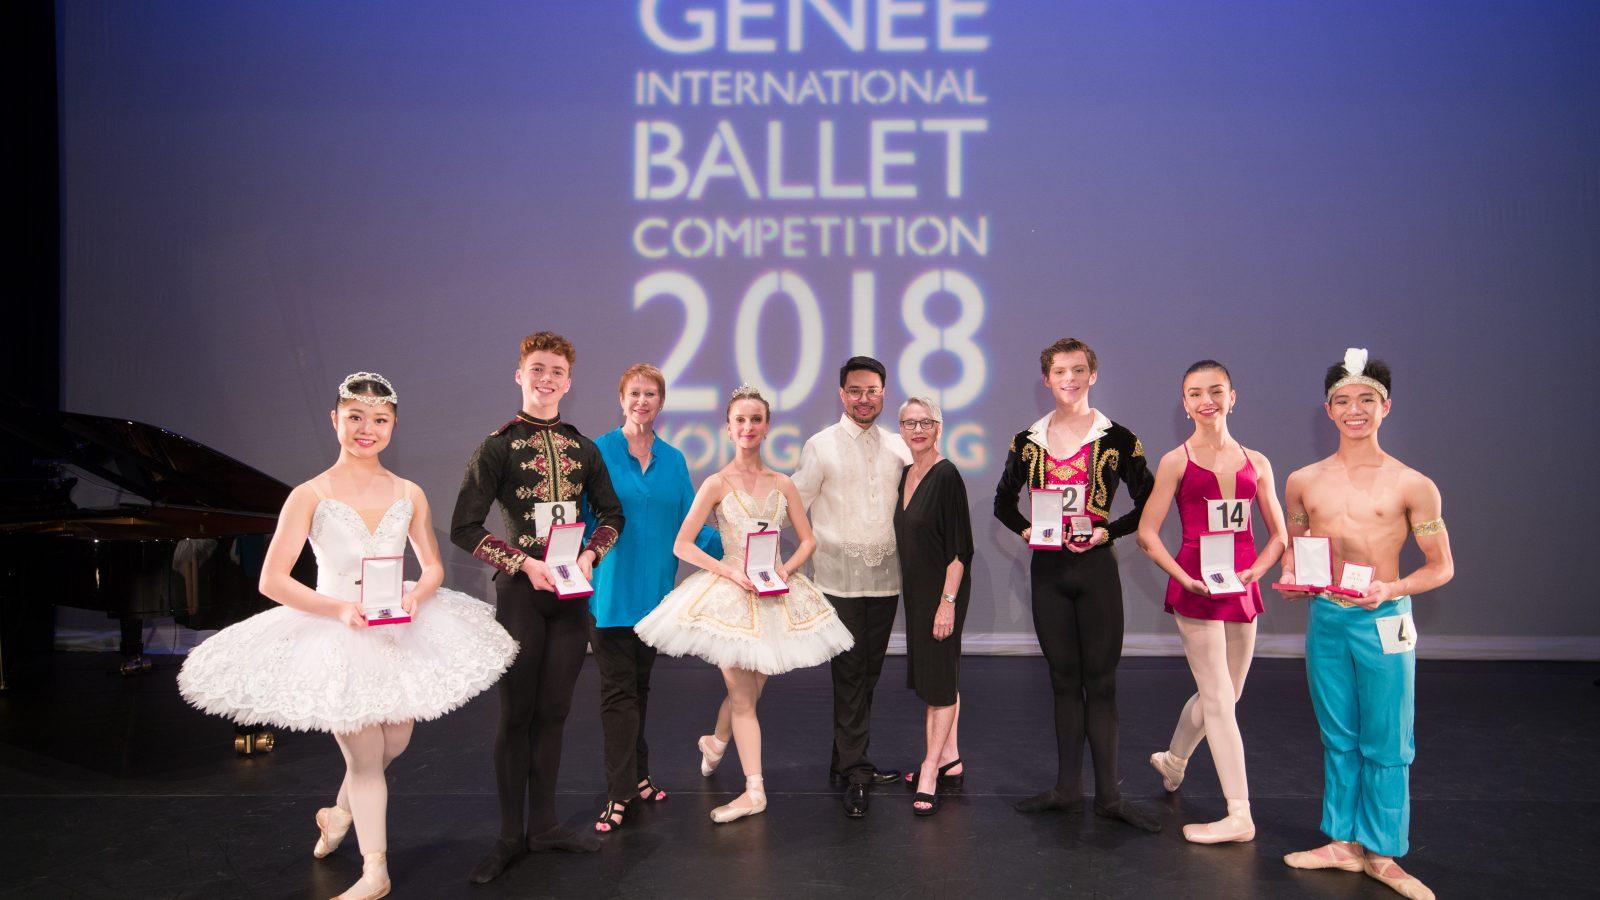 Sutton PR - Royal Academy of Dance - Genée 2018 medallists - Hilary Clark - Carlo